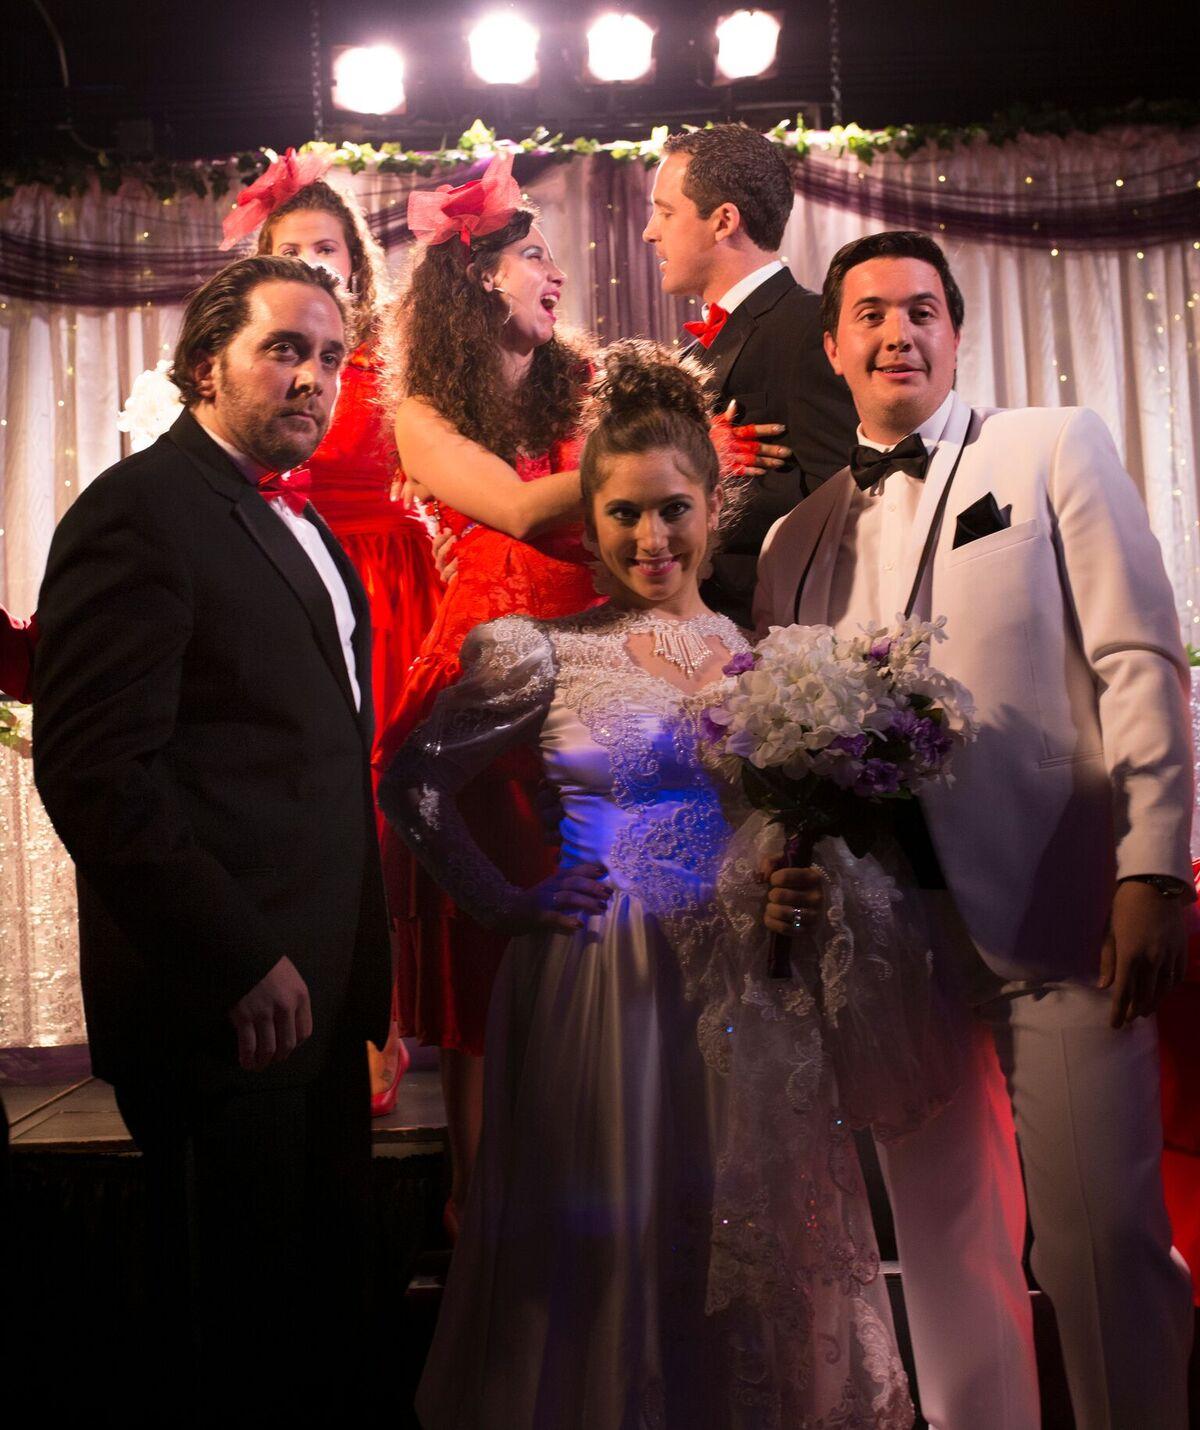 Tony n\' Tina\'s Wedding - Theatre reviews